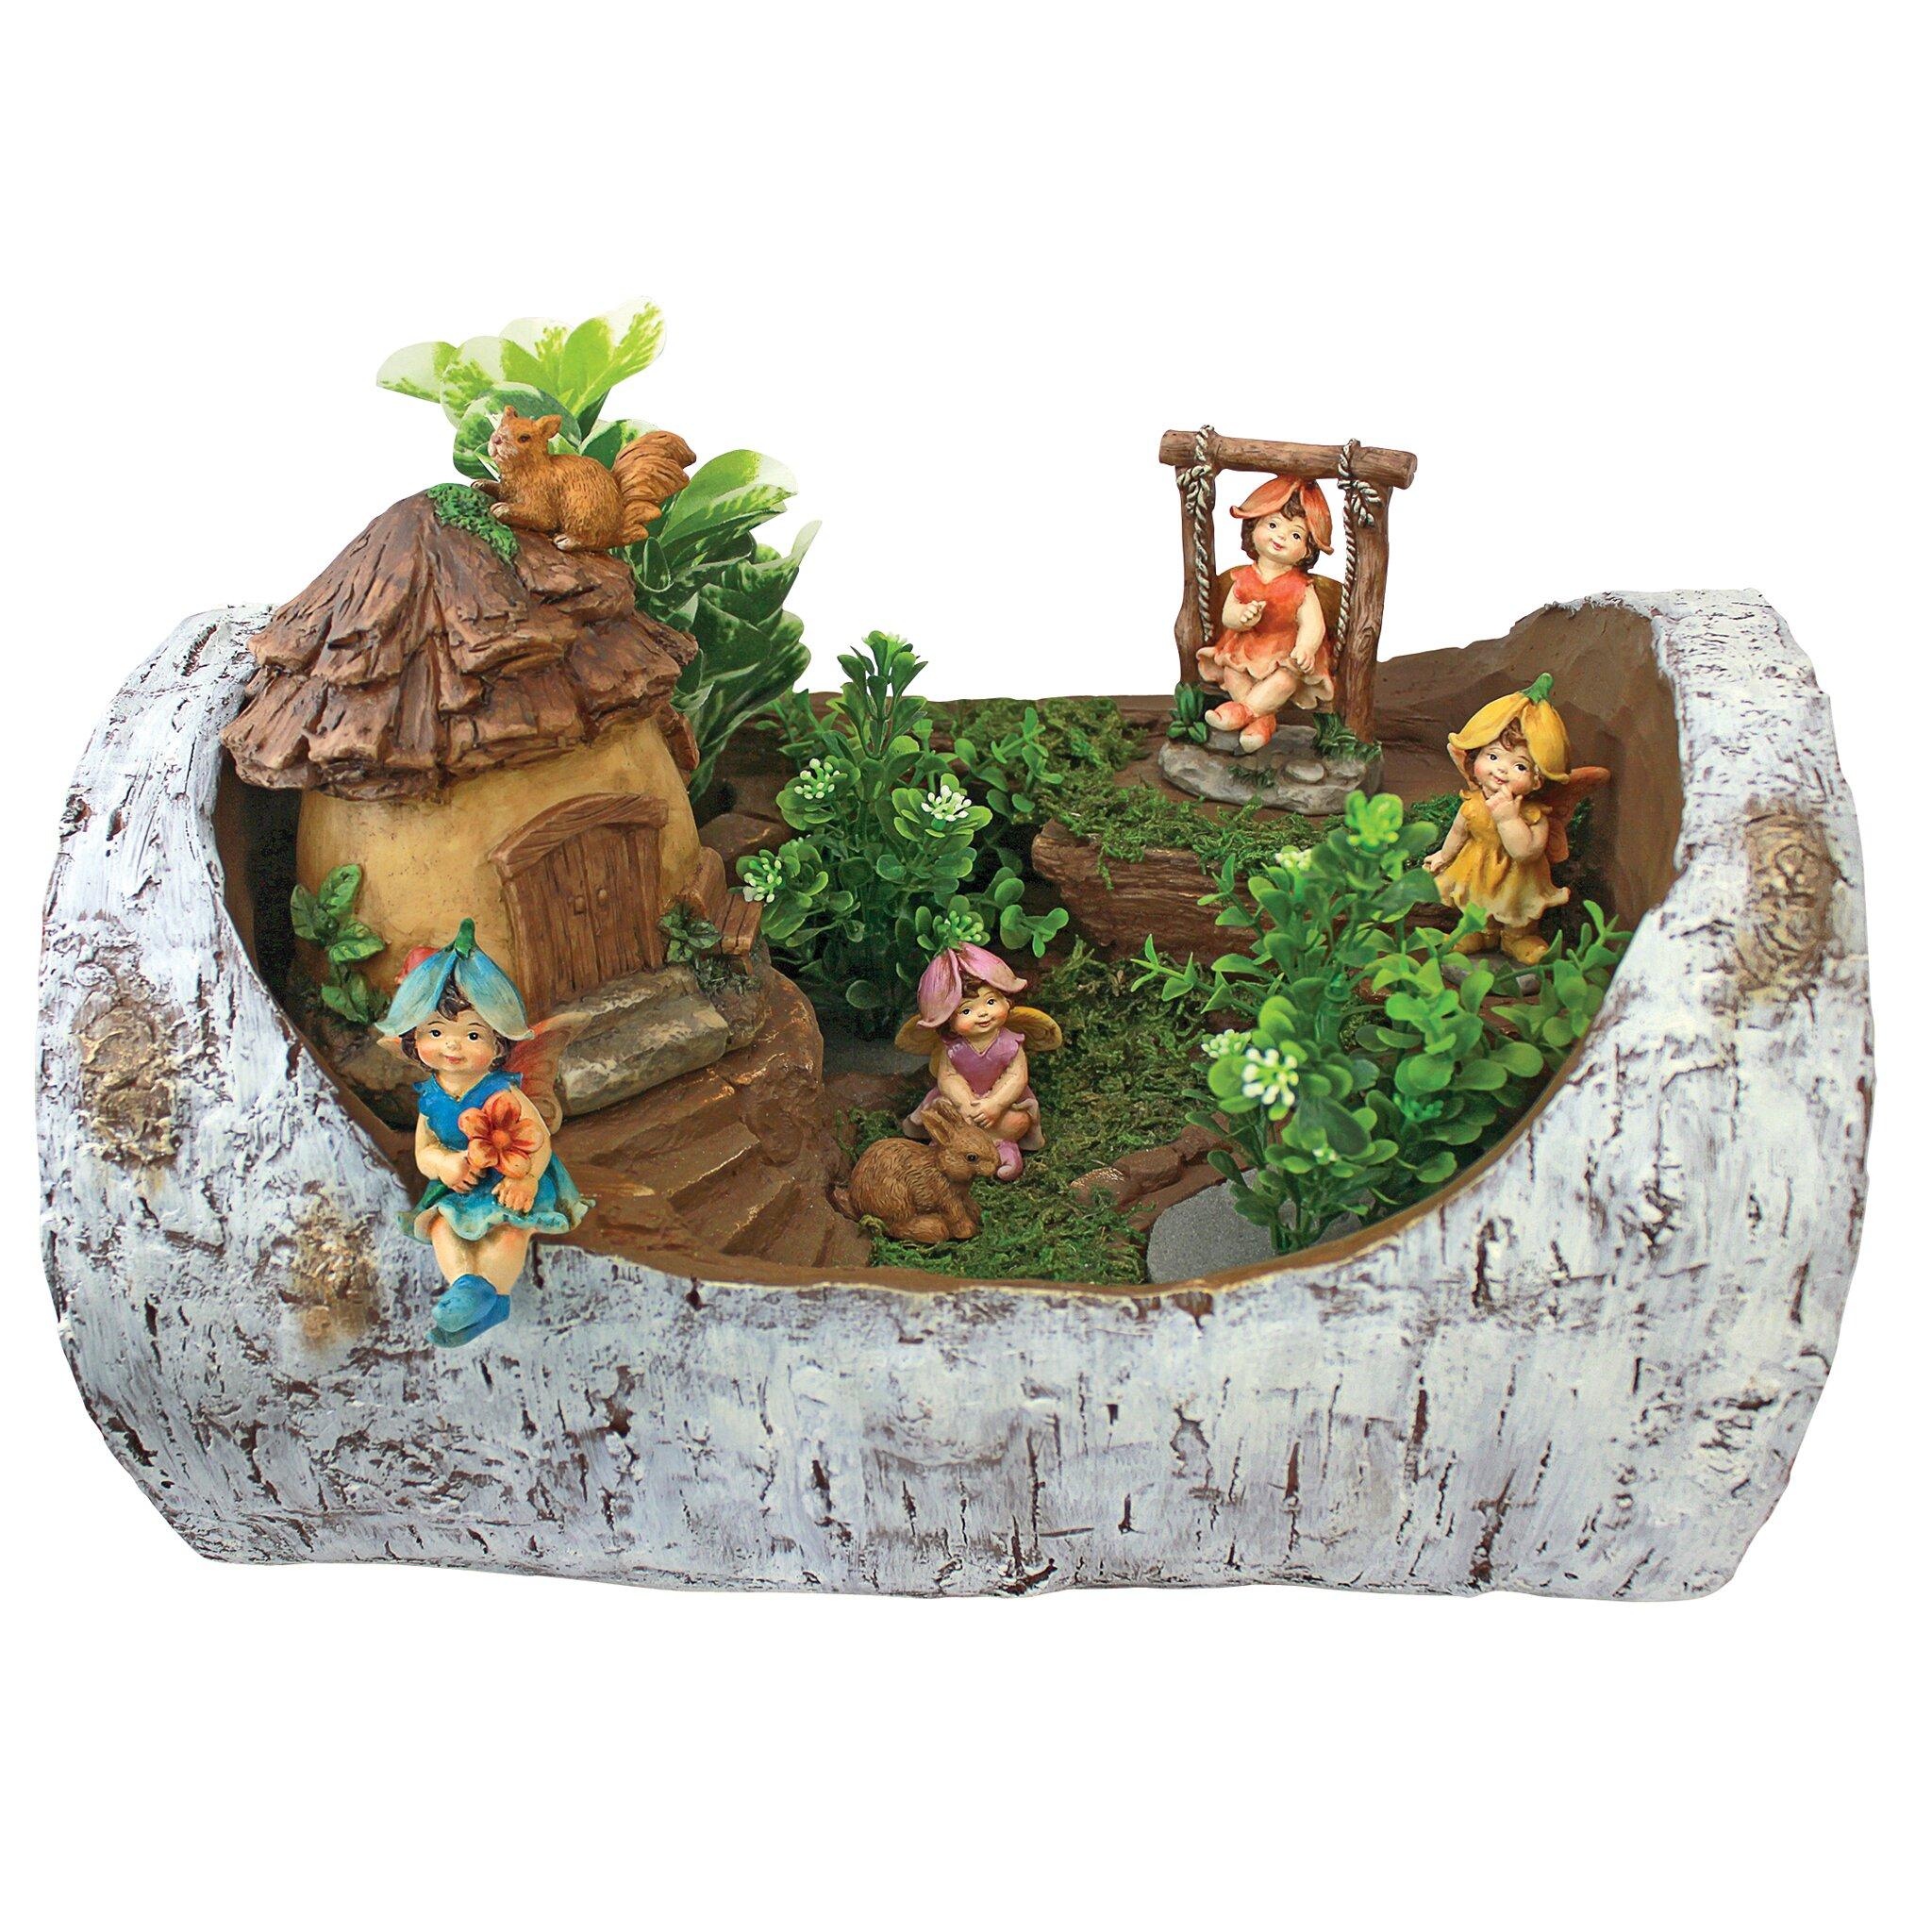 Garden Statue Fairy: Design Toscano Tiny Forest Friends Fairy Garden Statue